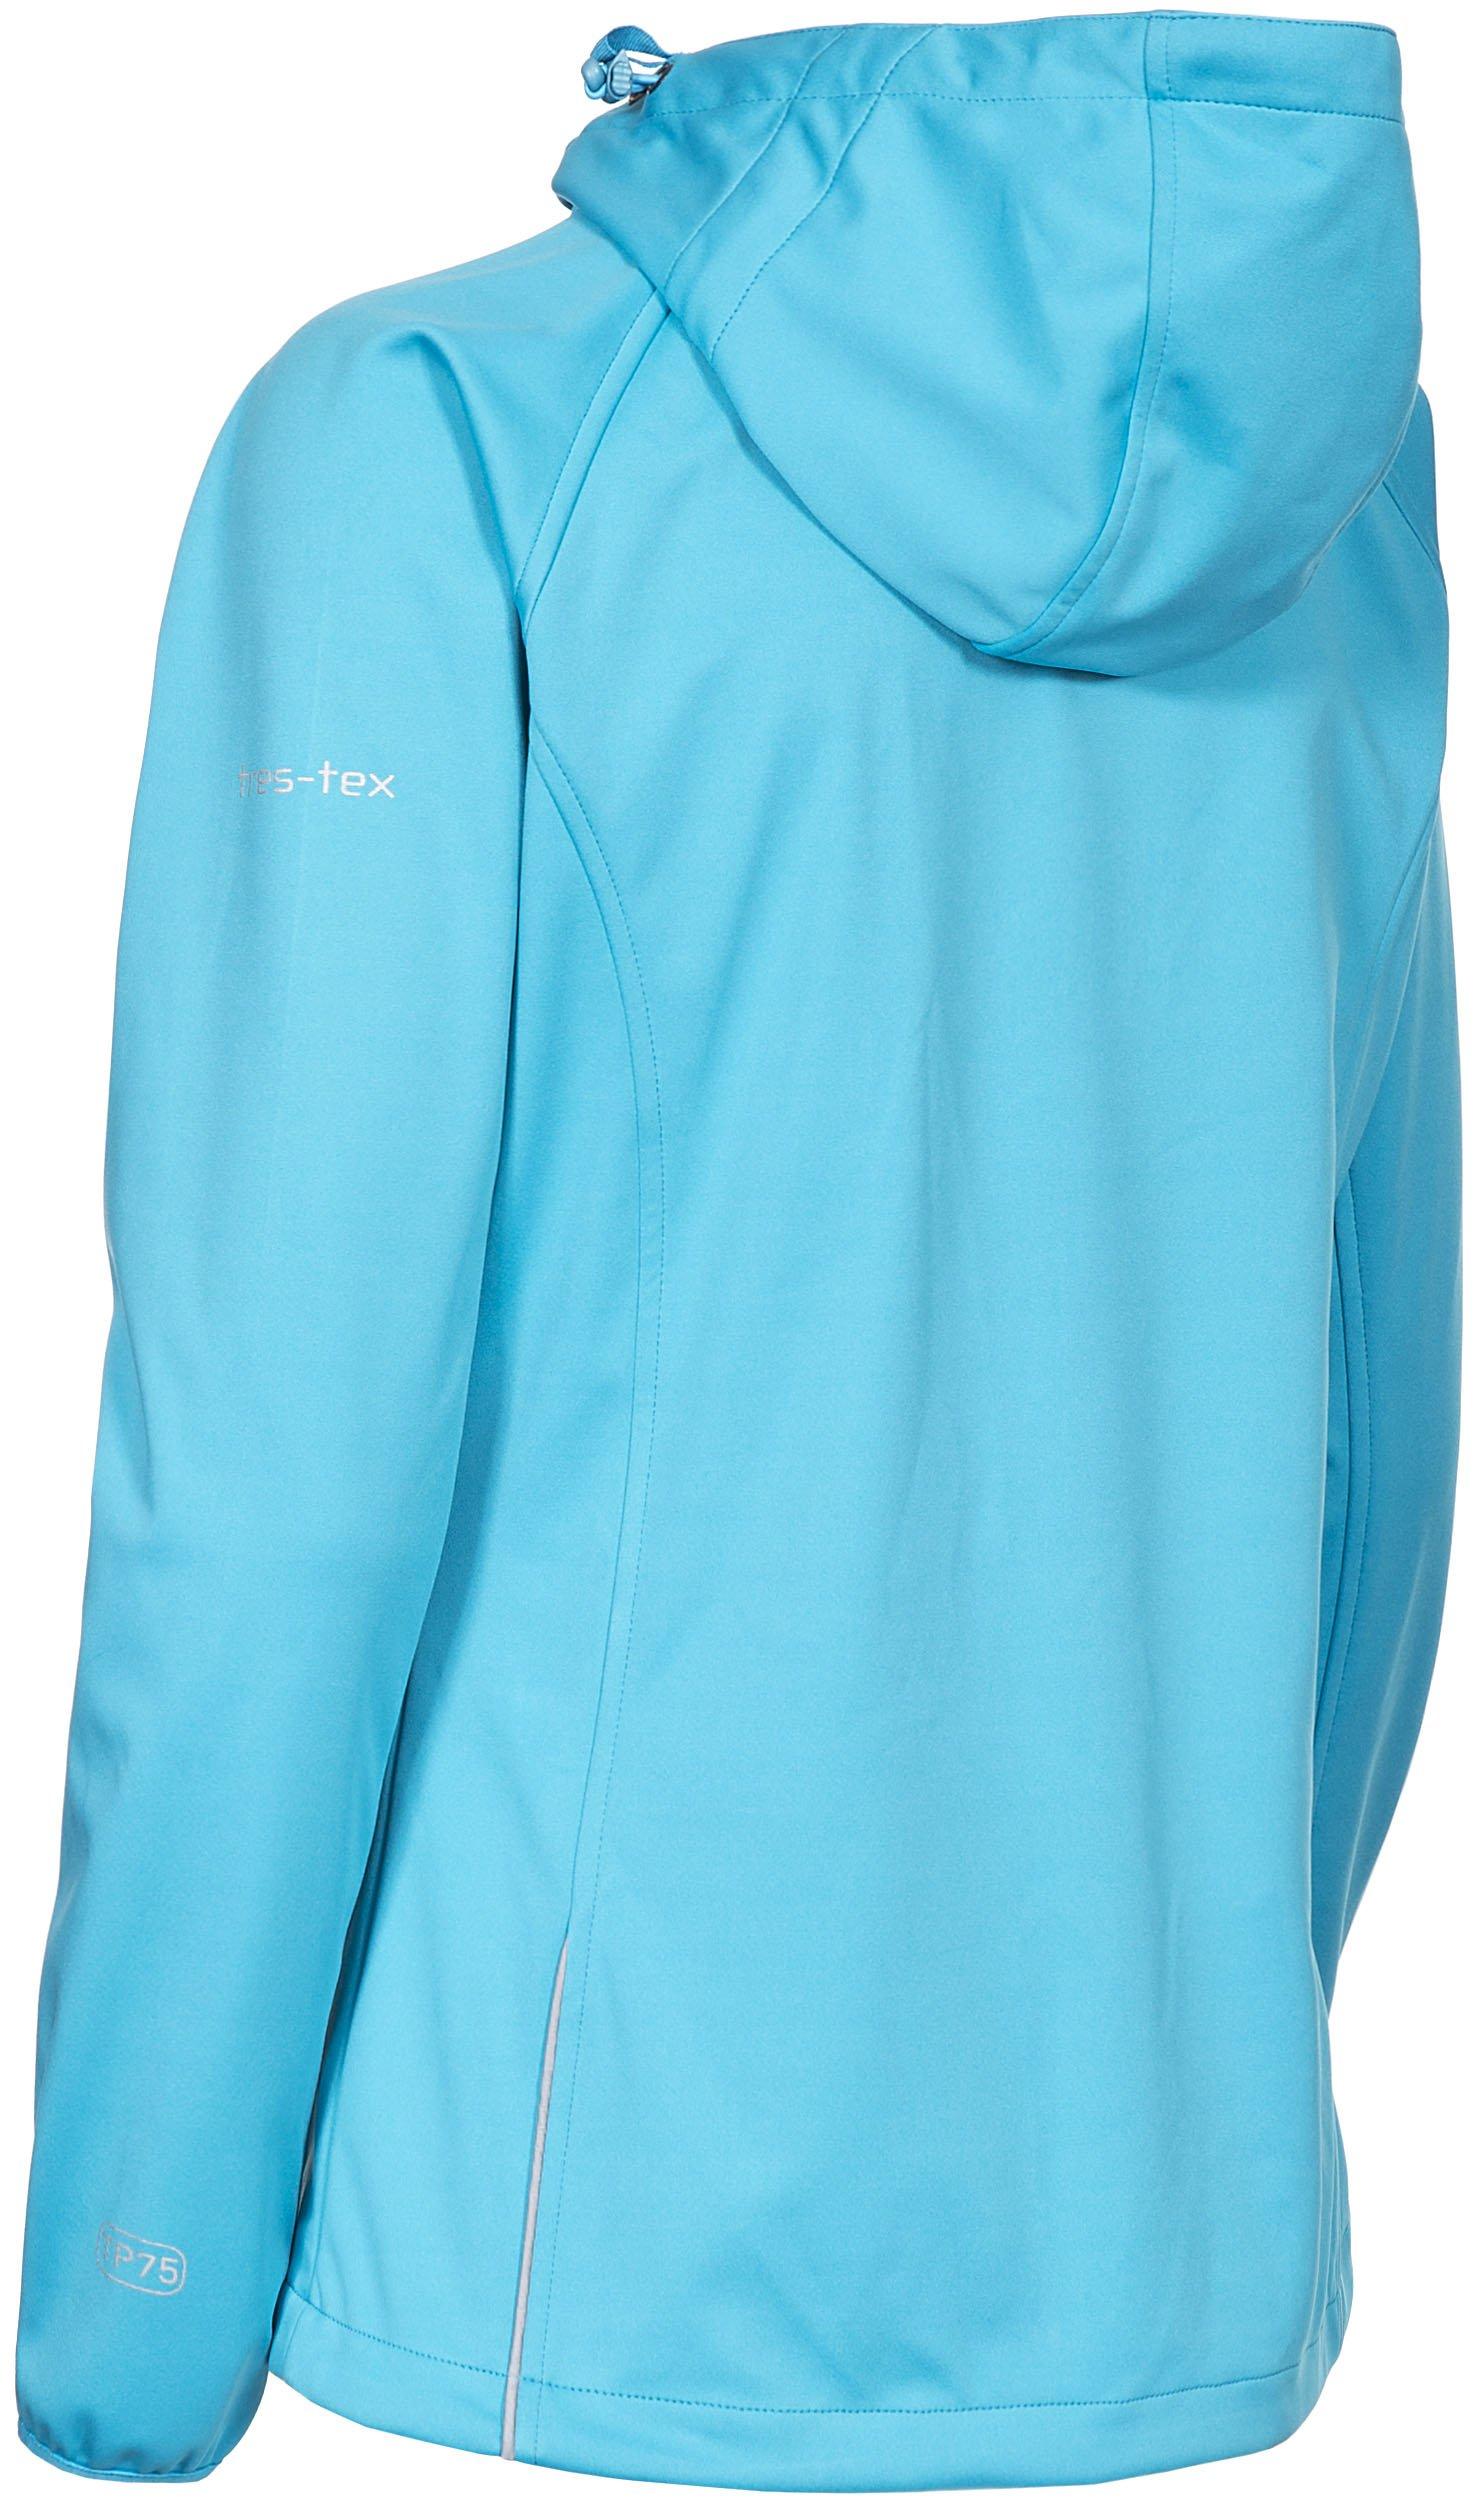 81pdrjwyW9L - Trespass Women's Sisely Softshell Jacket